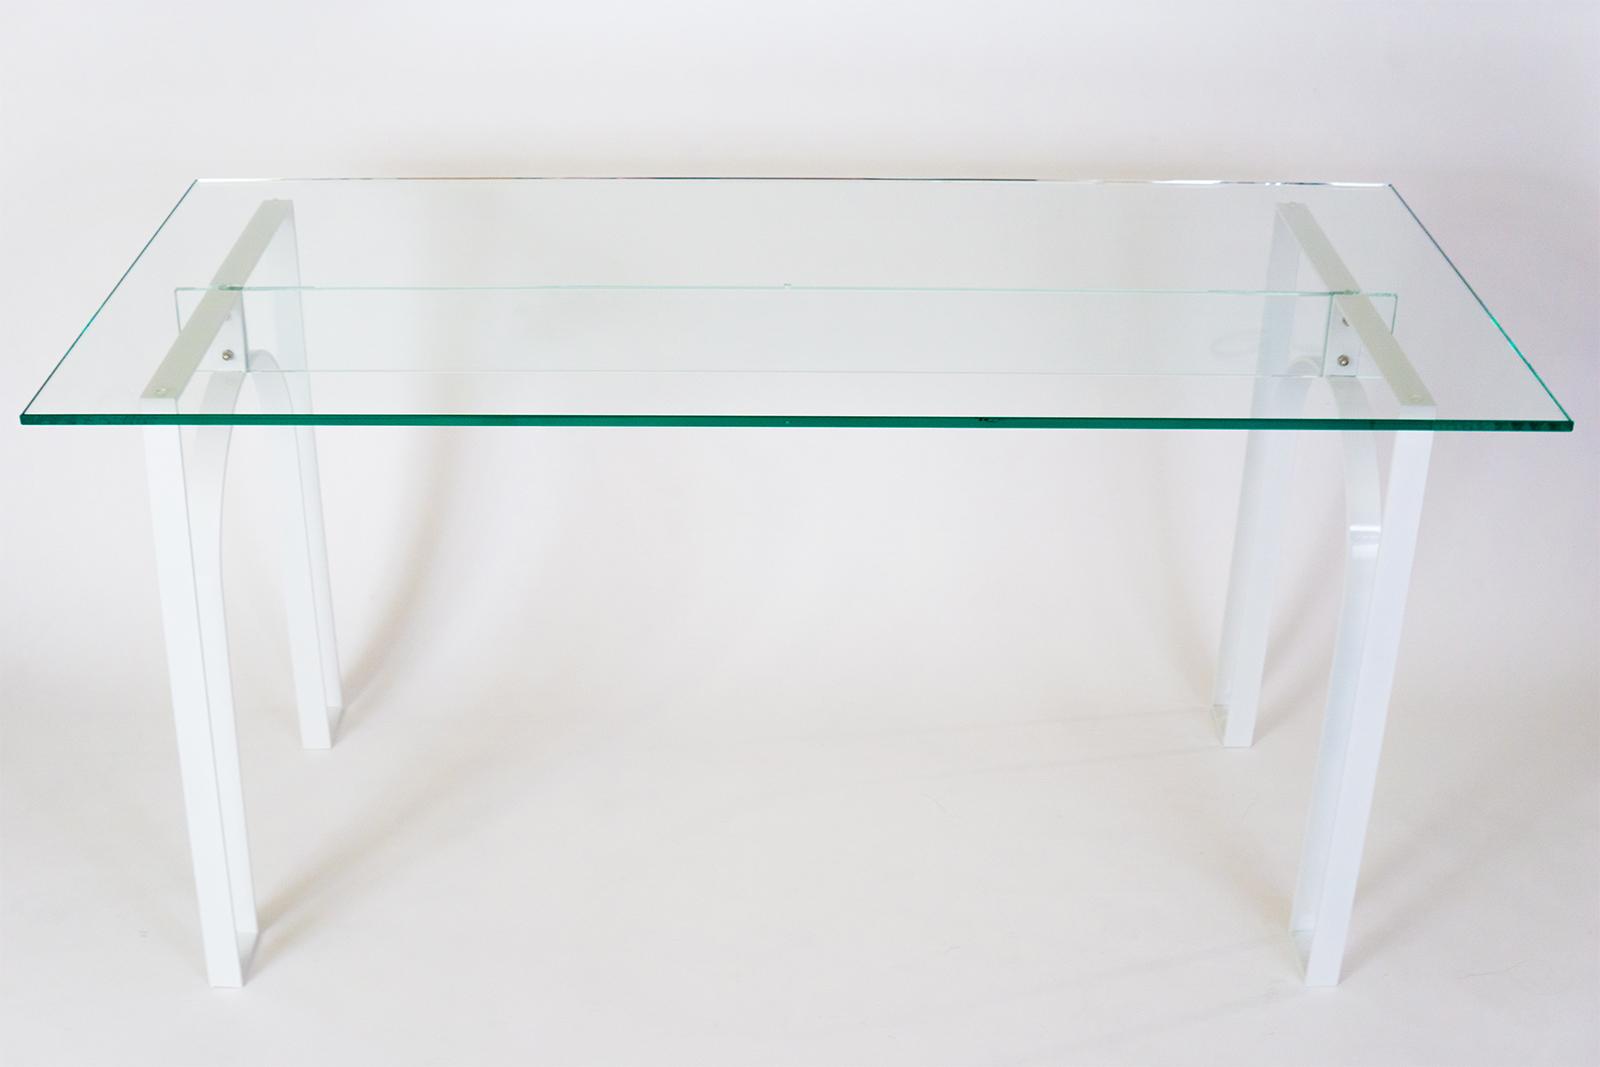 durodeco_Arch Desk (2).jpg